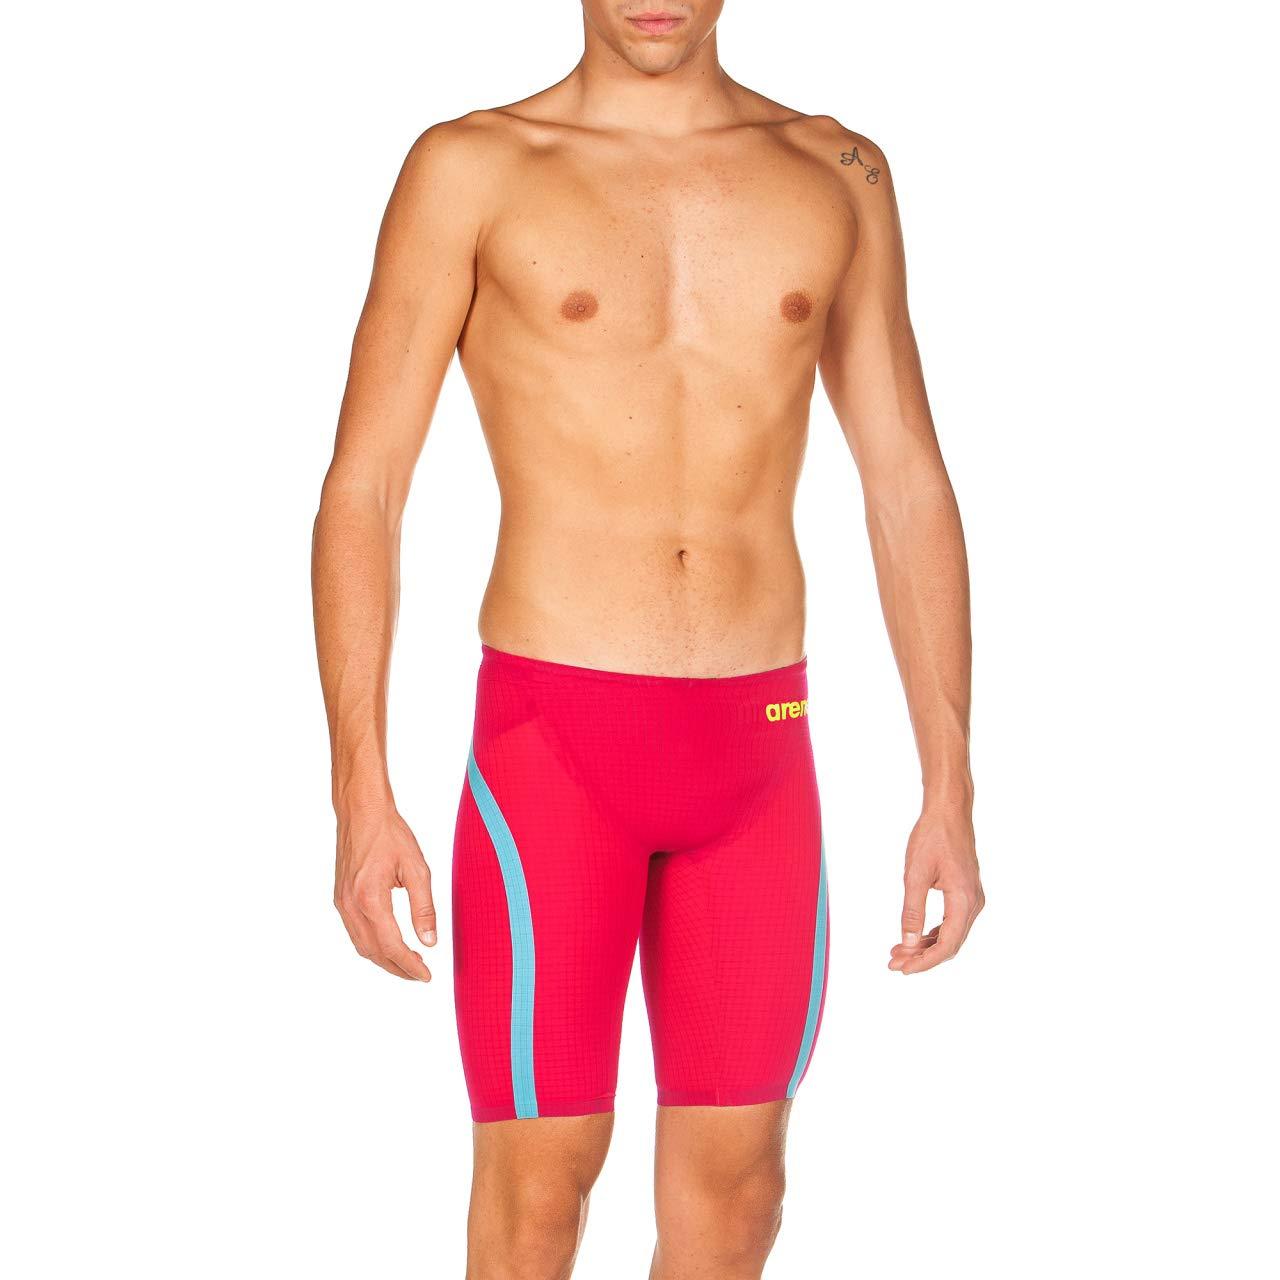 ARENA Powerskin Carbon Flex VX Mens Jammers Racing Swimsuit